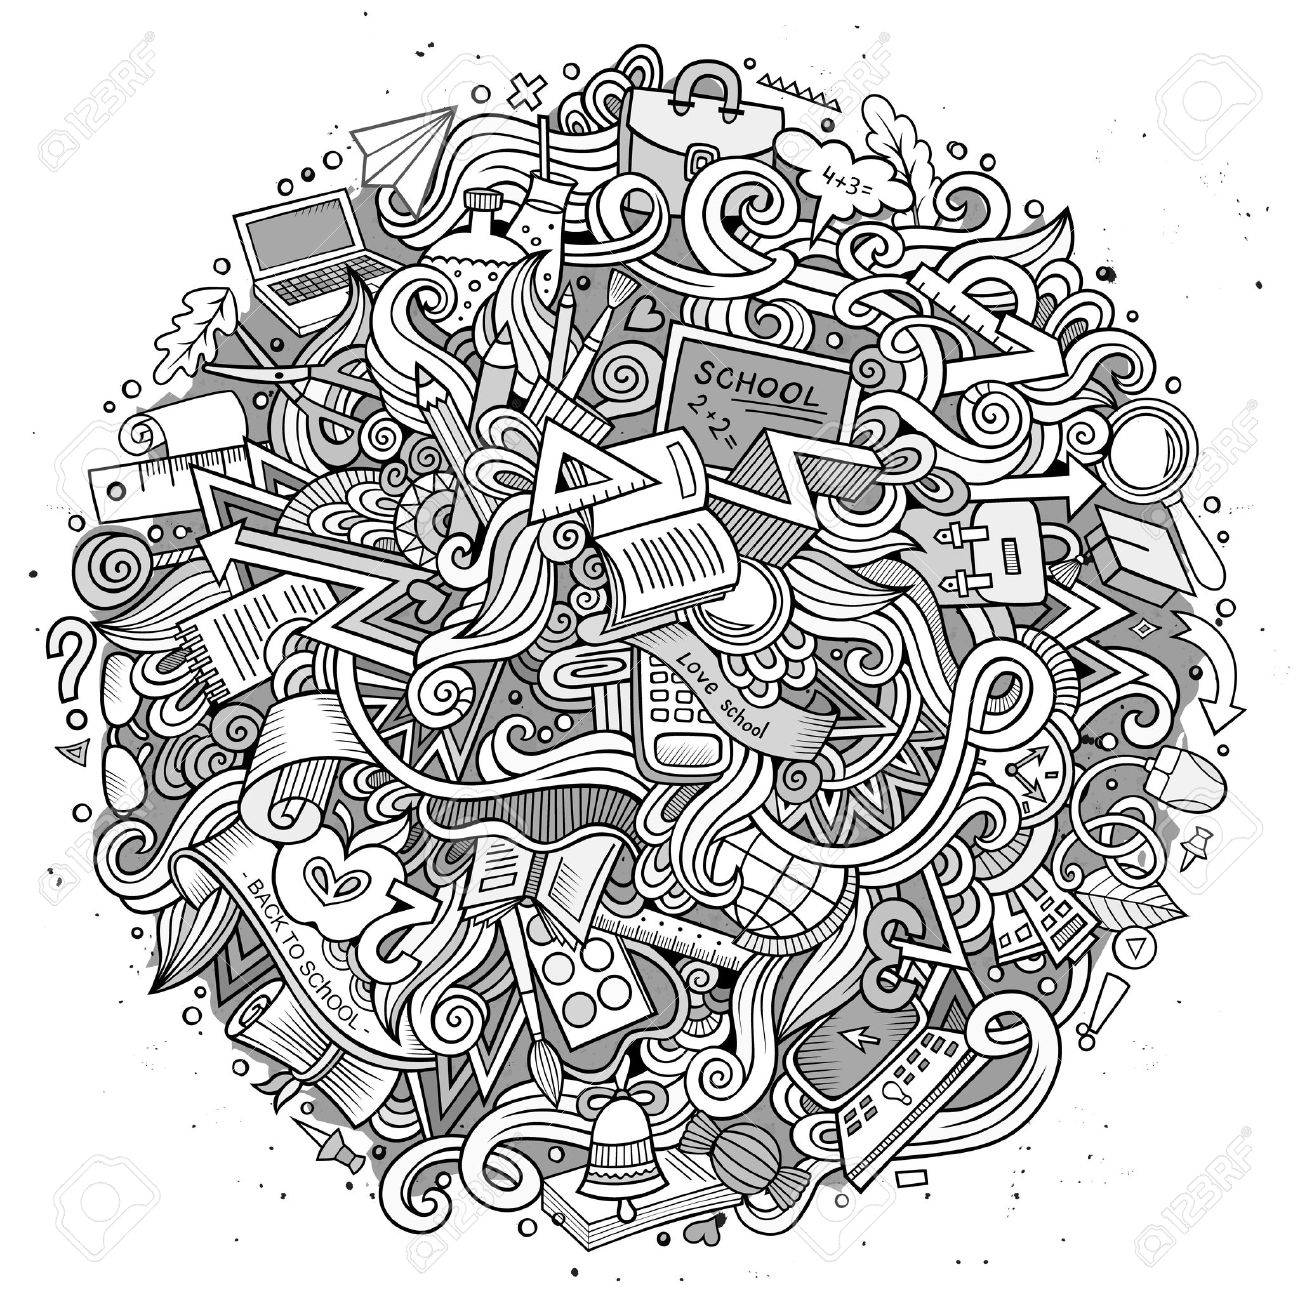 Cartoon Cute Doodles Hand Drawn School Illustration Line Art Royalty Free Cliparts Vectors And Stock Illustration Image 62529154